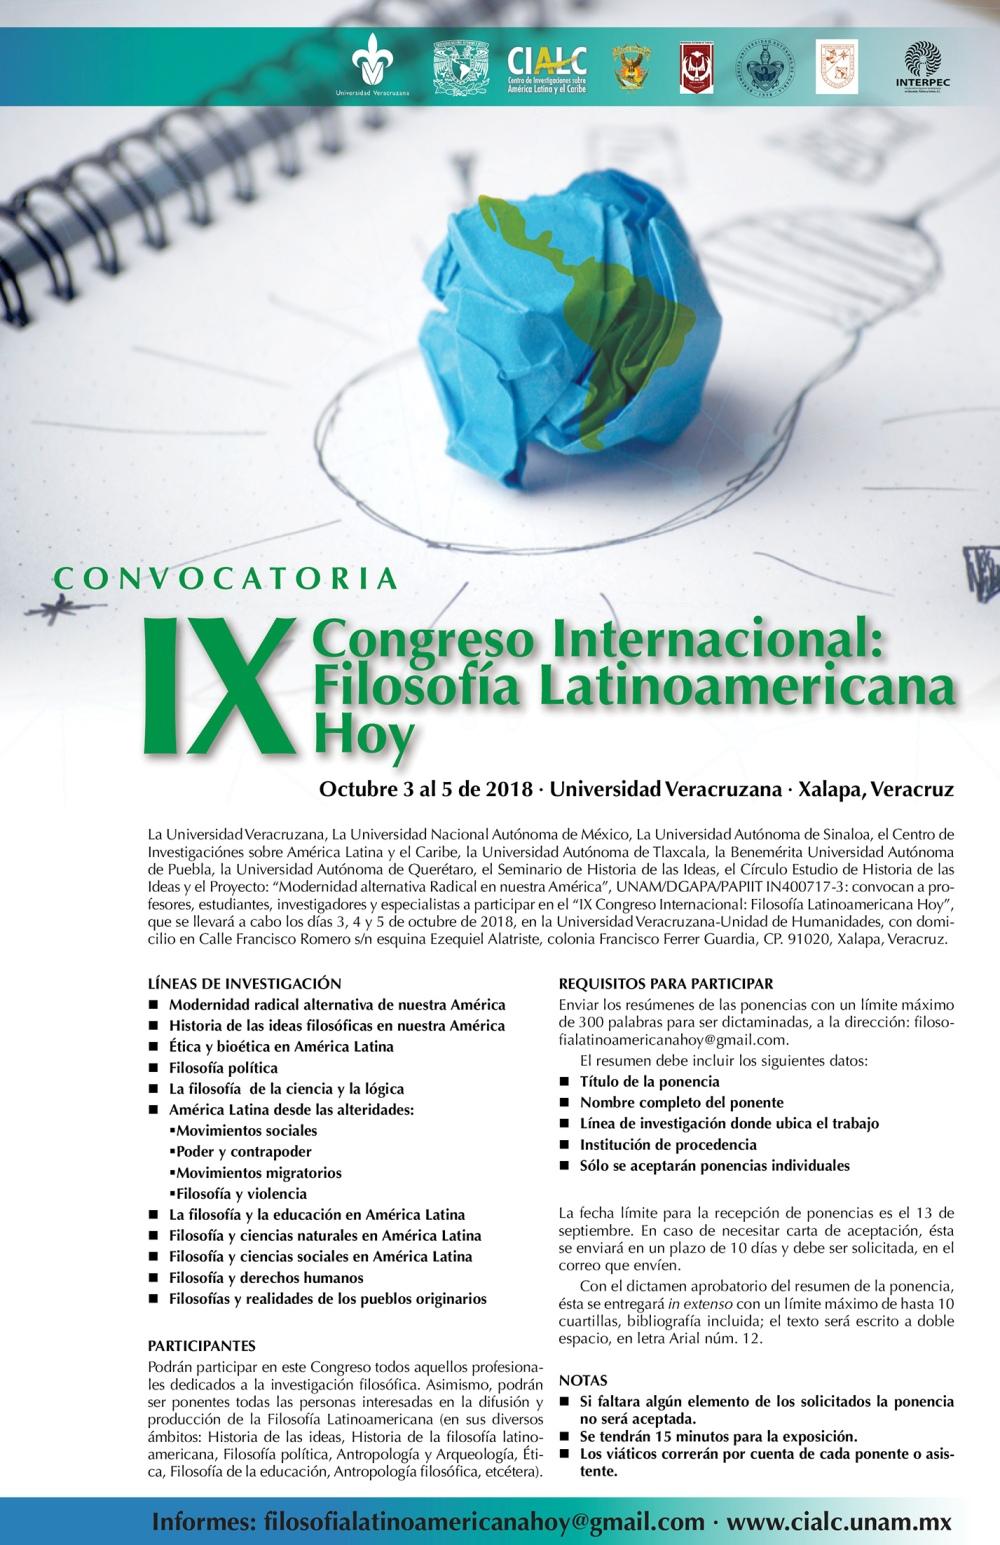 IX CONGRASO FIL LAT HOY